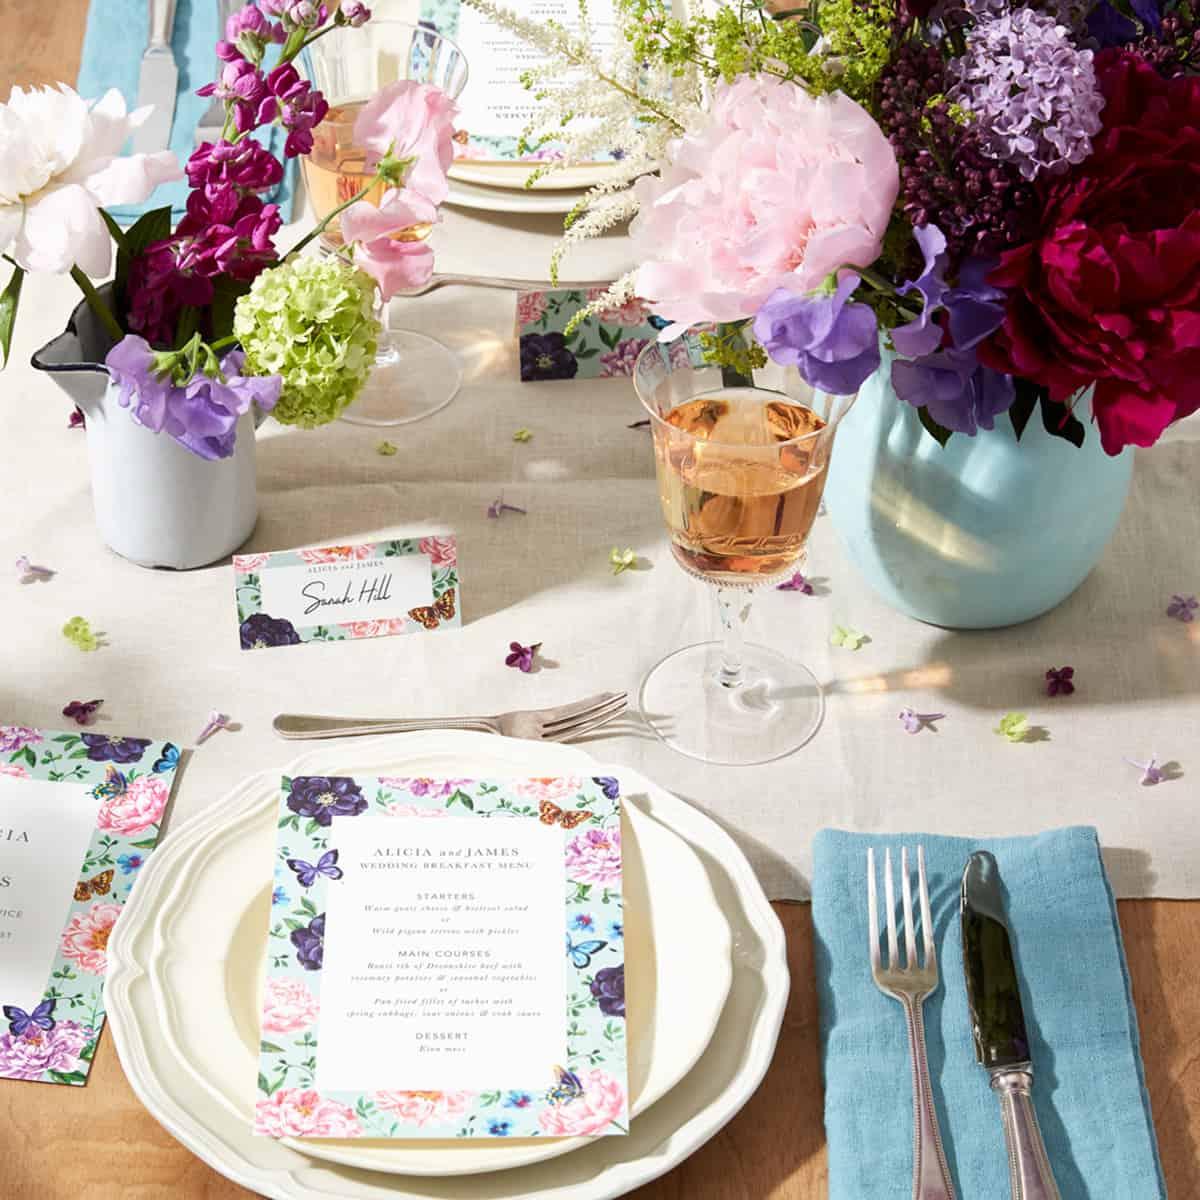 05.18_TheFold_WeddingTableSettings_CountryFlorals_social